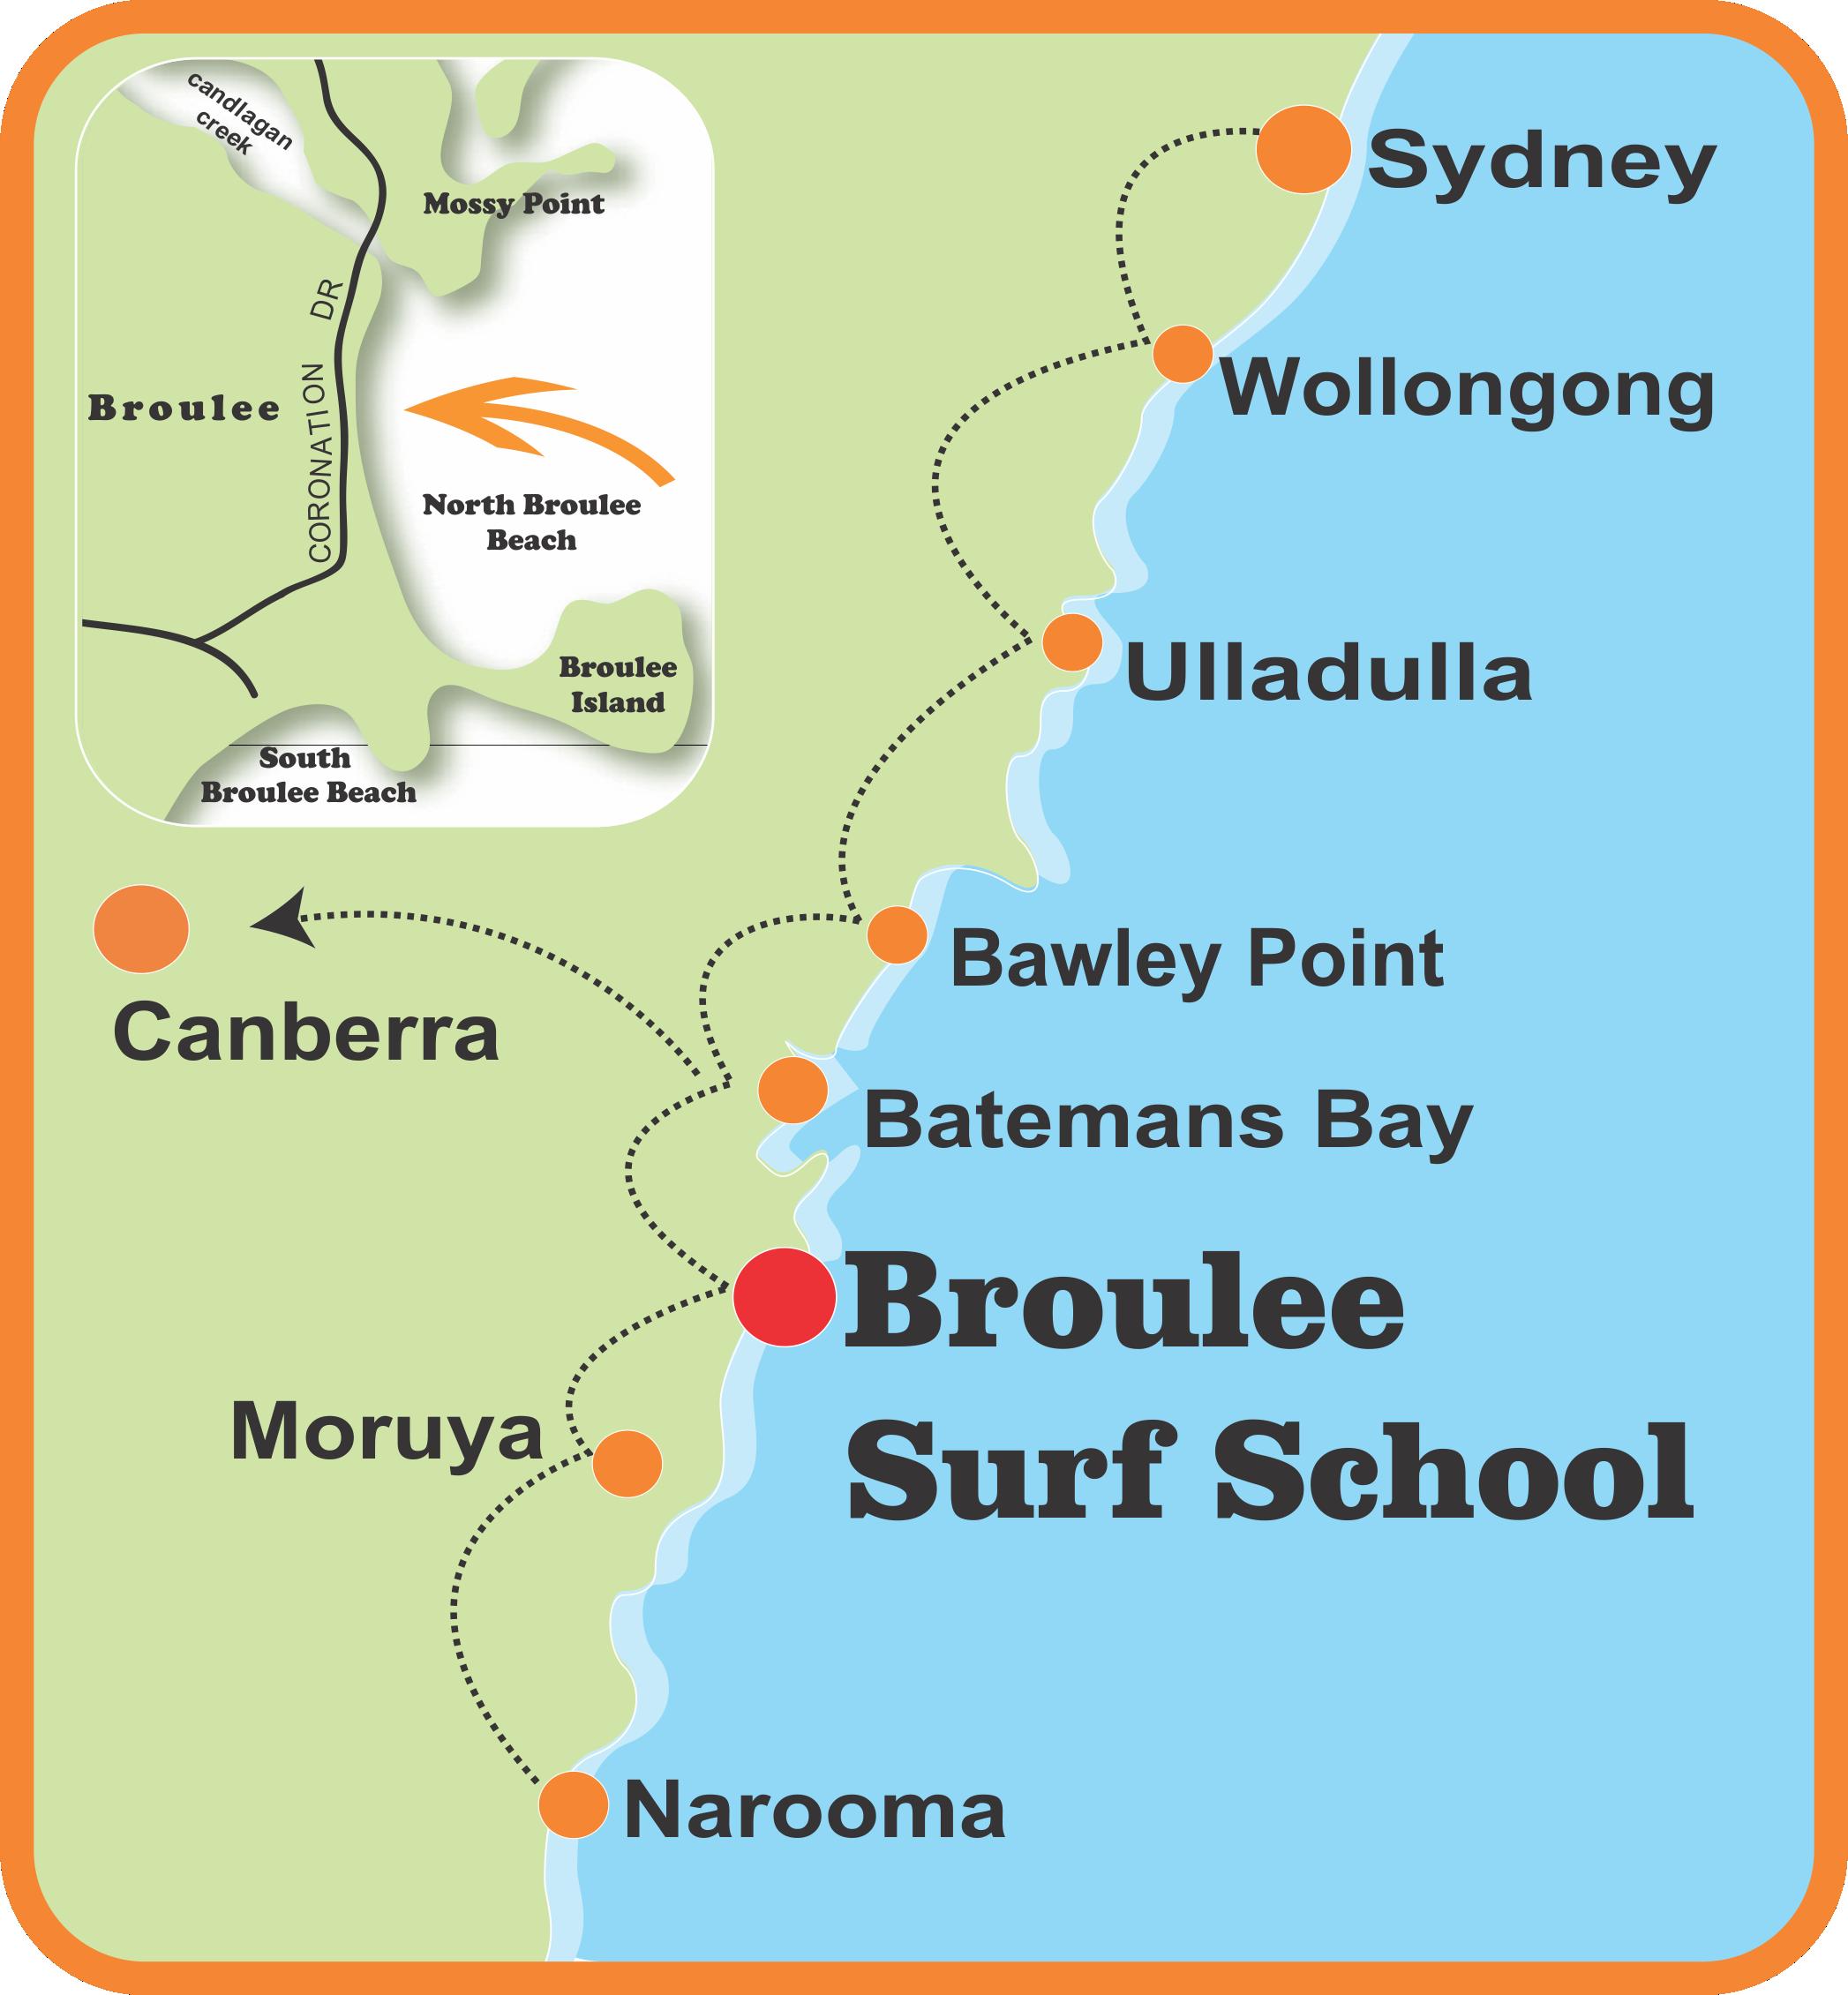 Broulee Surf School Batemans Bay